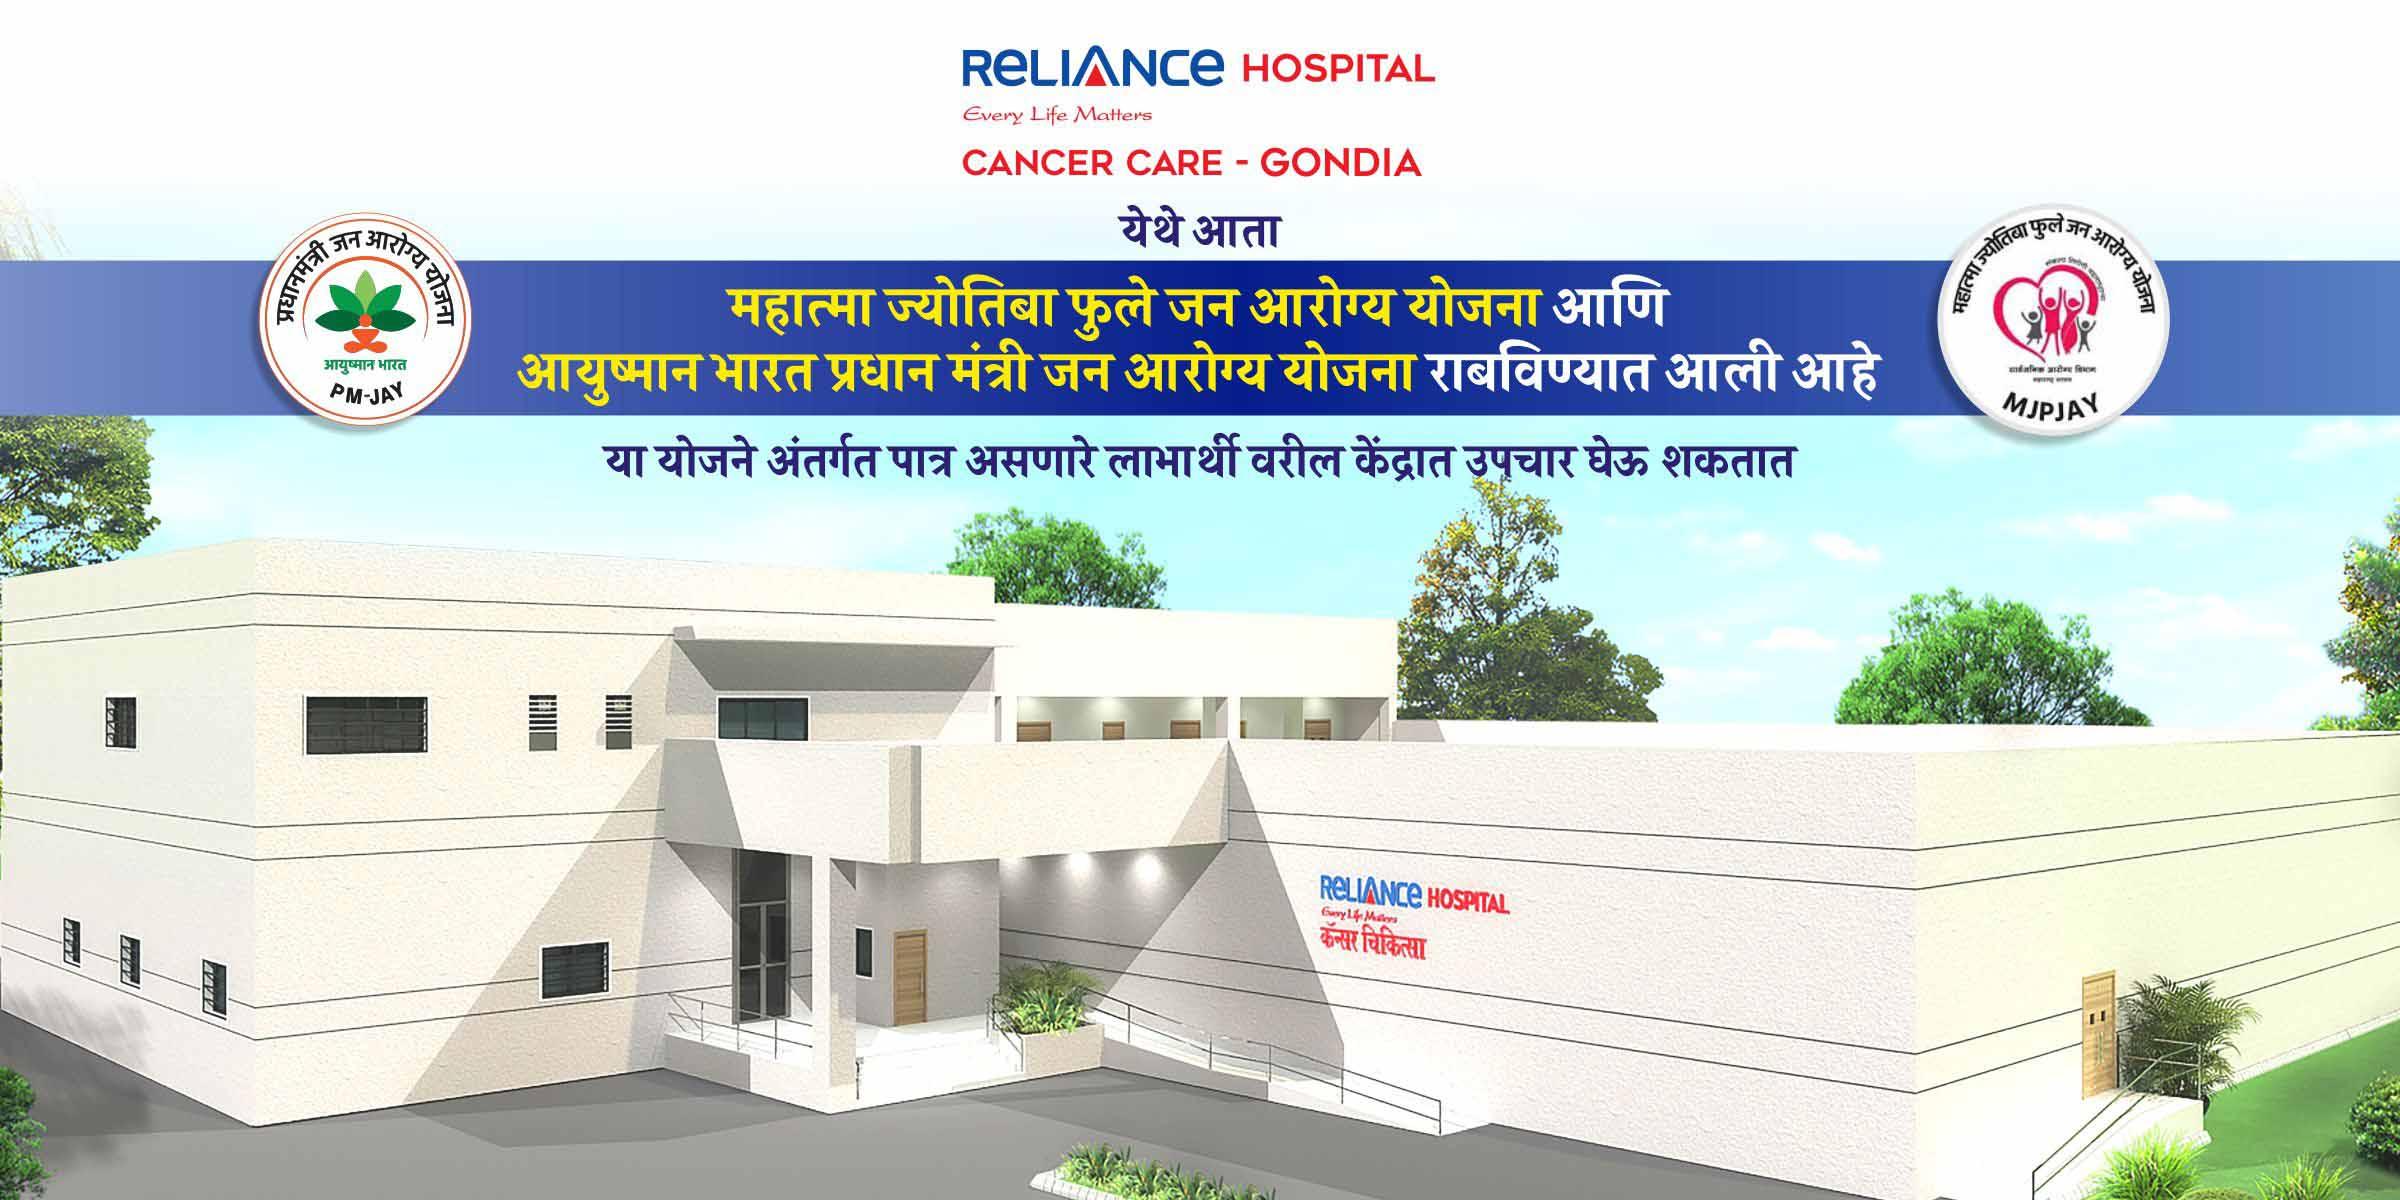 Reliance Hospital, Gondia now part of the Mahatma Jyotiba Phule Jan Arogya Yojana